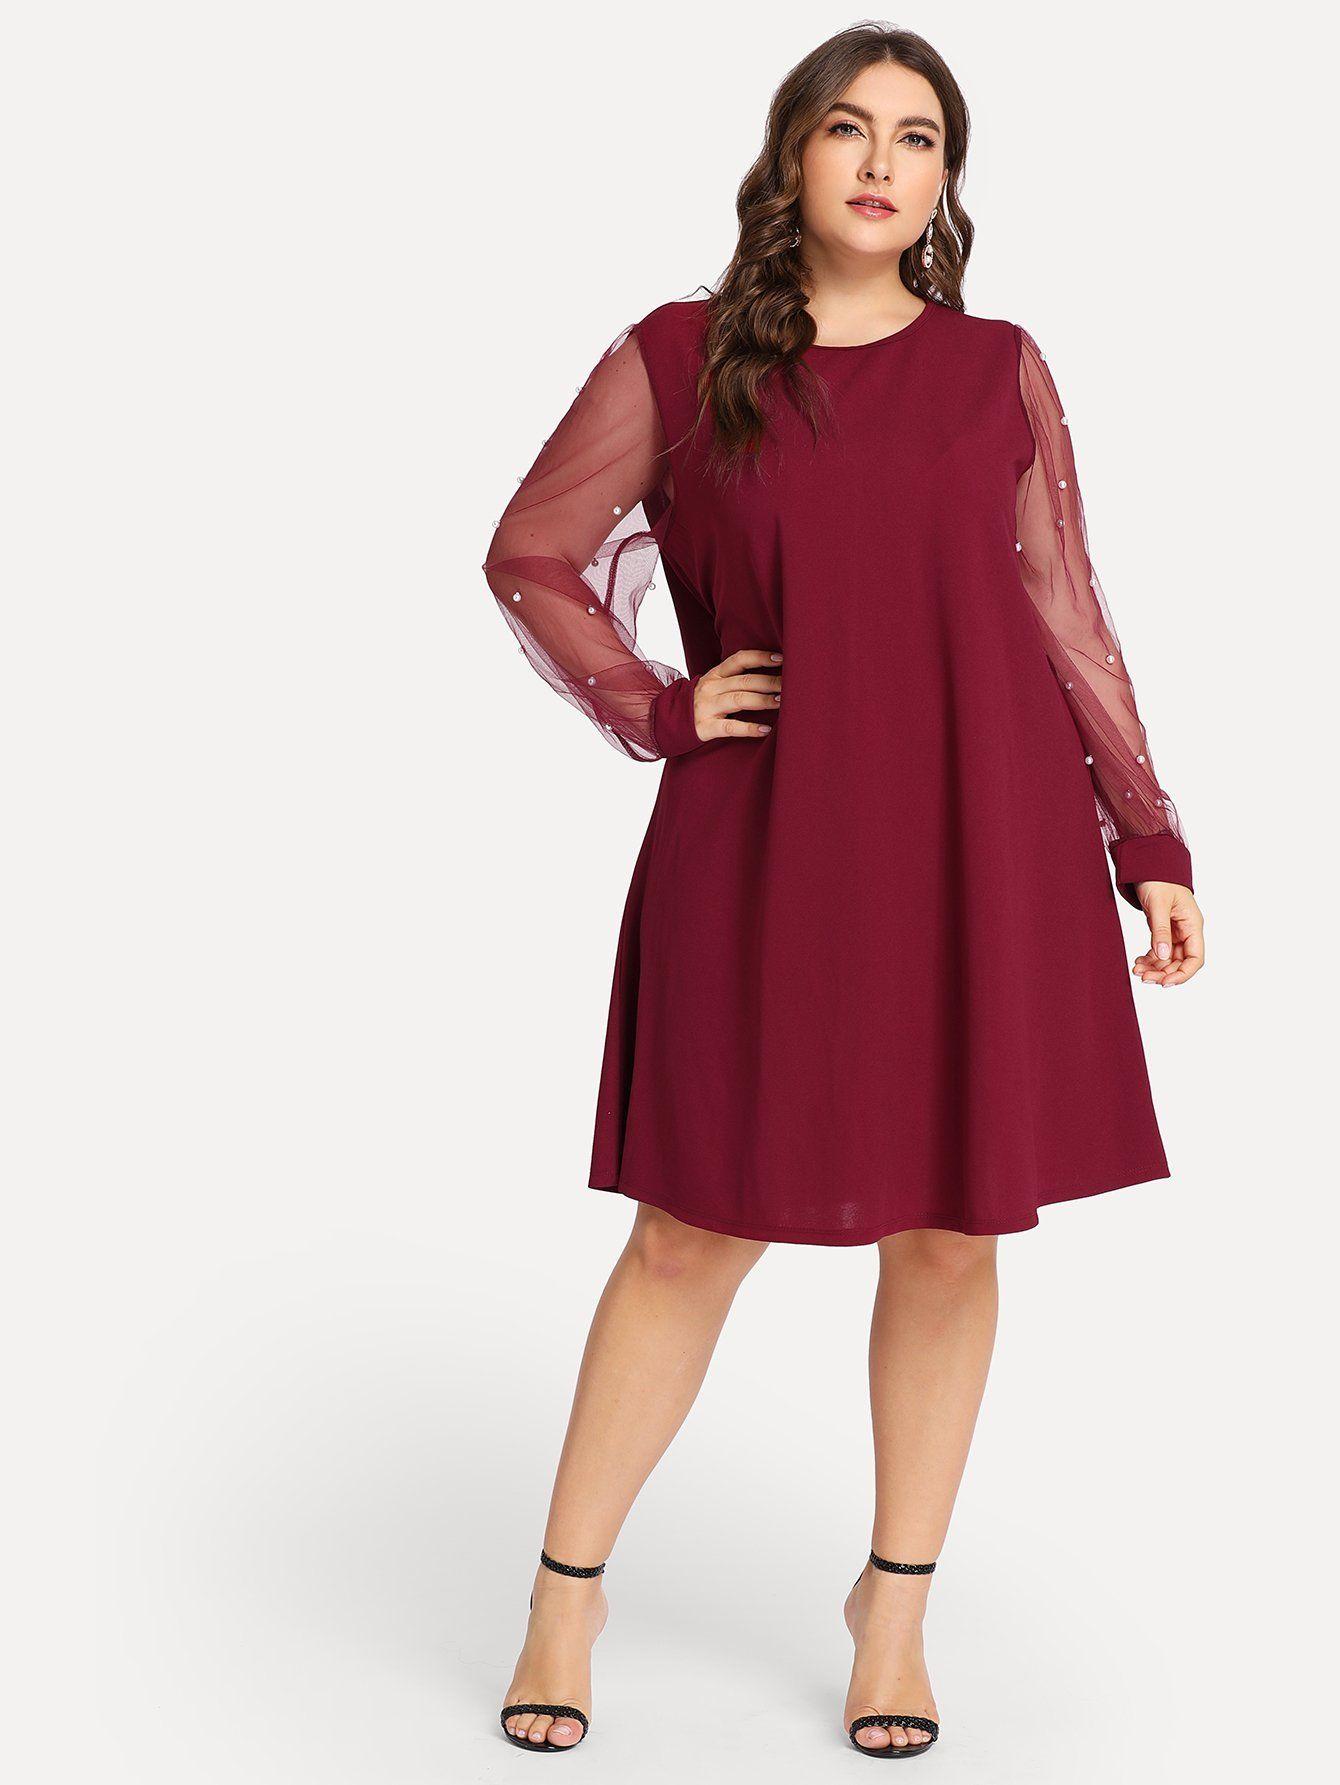 b17d89a65e1 Plus Size Pearl Beading Mesh Sleeve Burgundy Dress FREE SHIP ...